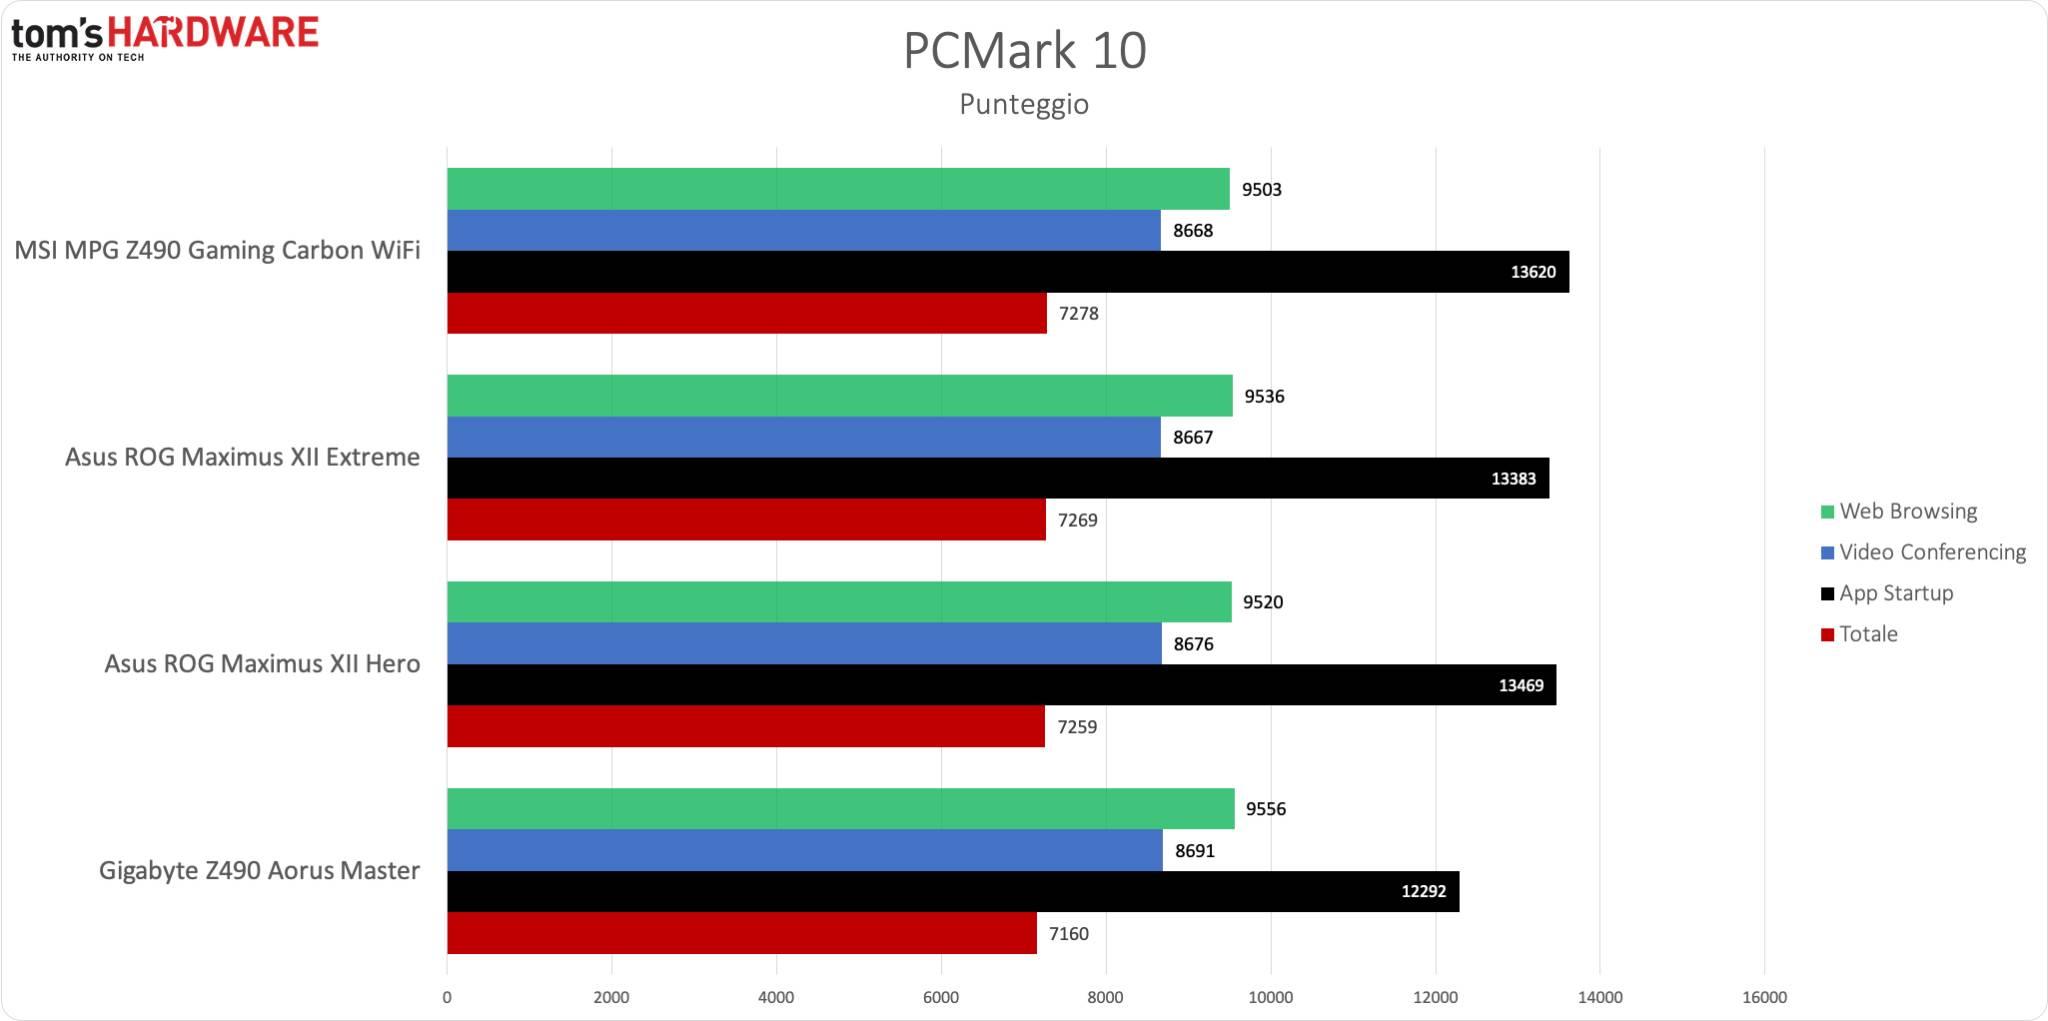 MSI Z490 Gaming Carbon WiFi - PCM10